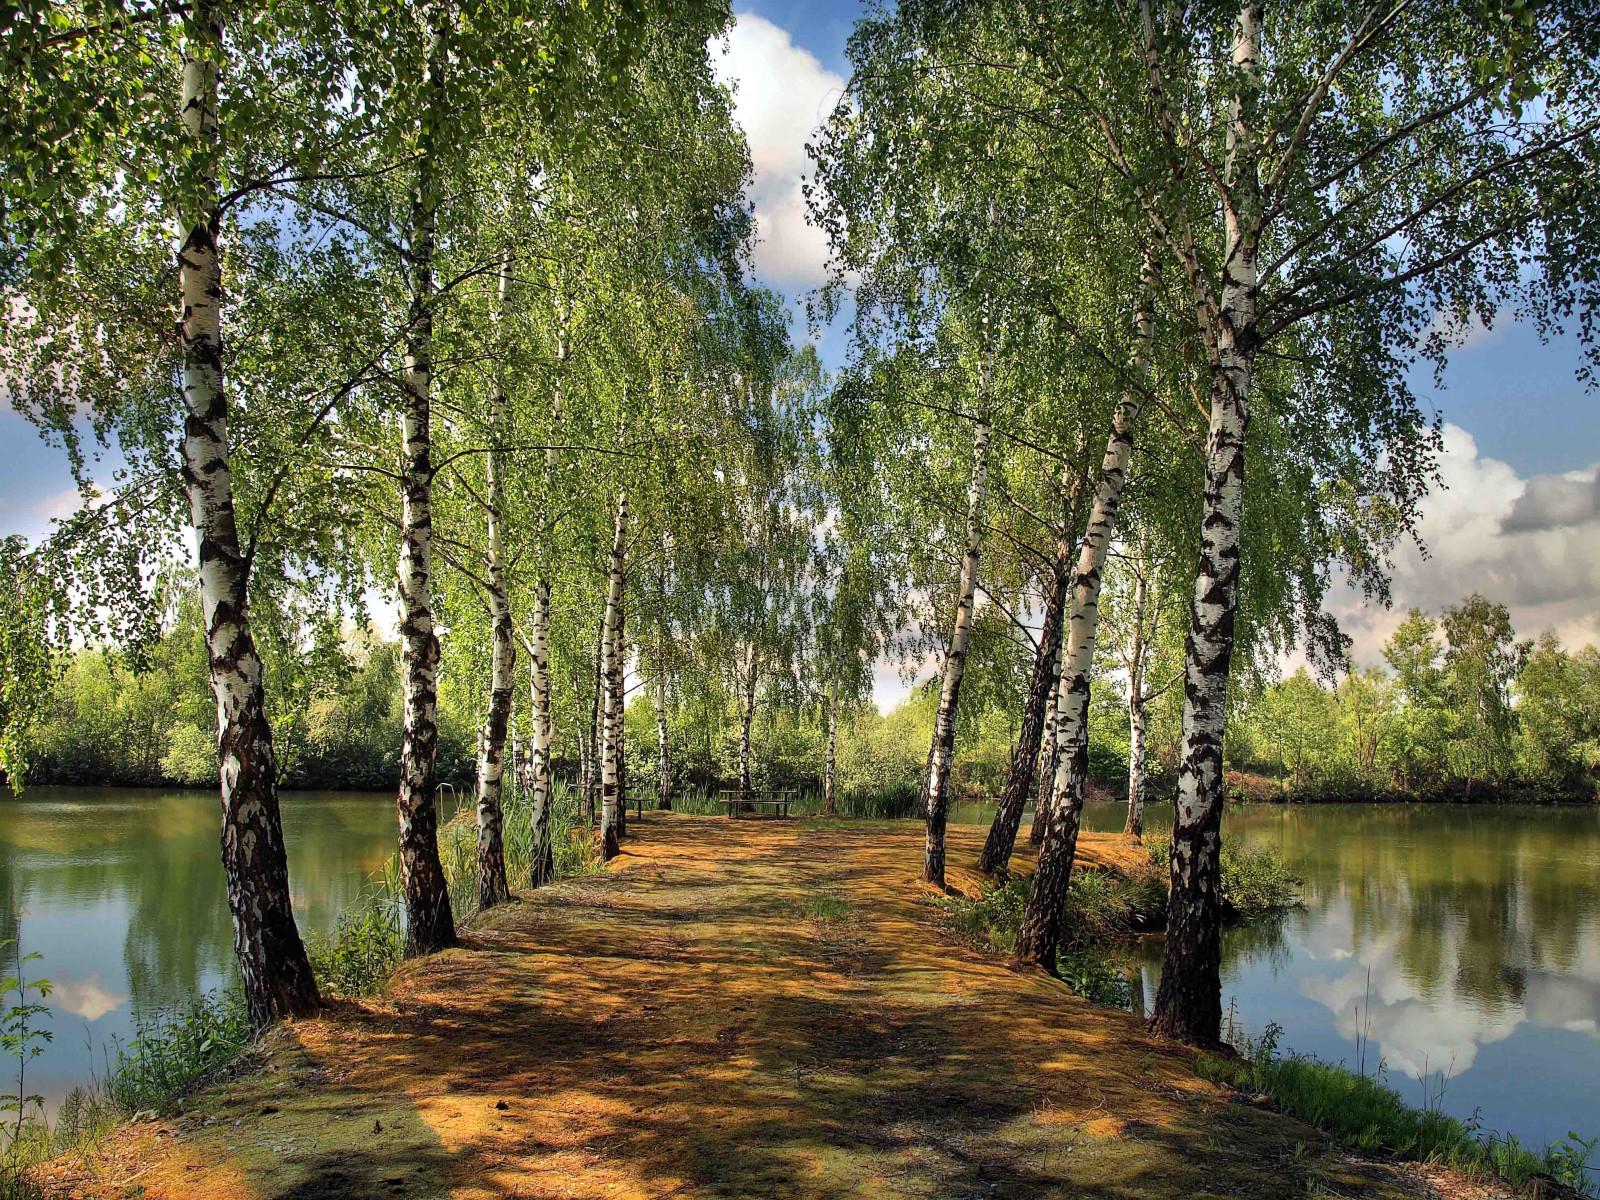 All Car Hd Wallpaper Download Wallpaper Summer Pond Park Birch Landscape 4032x3024